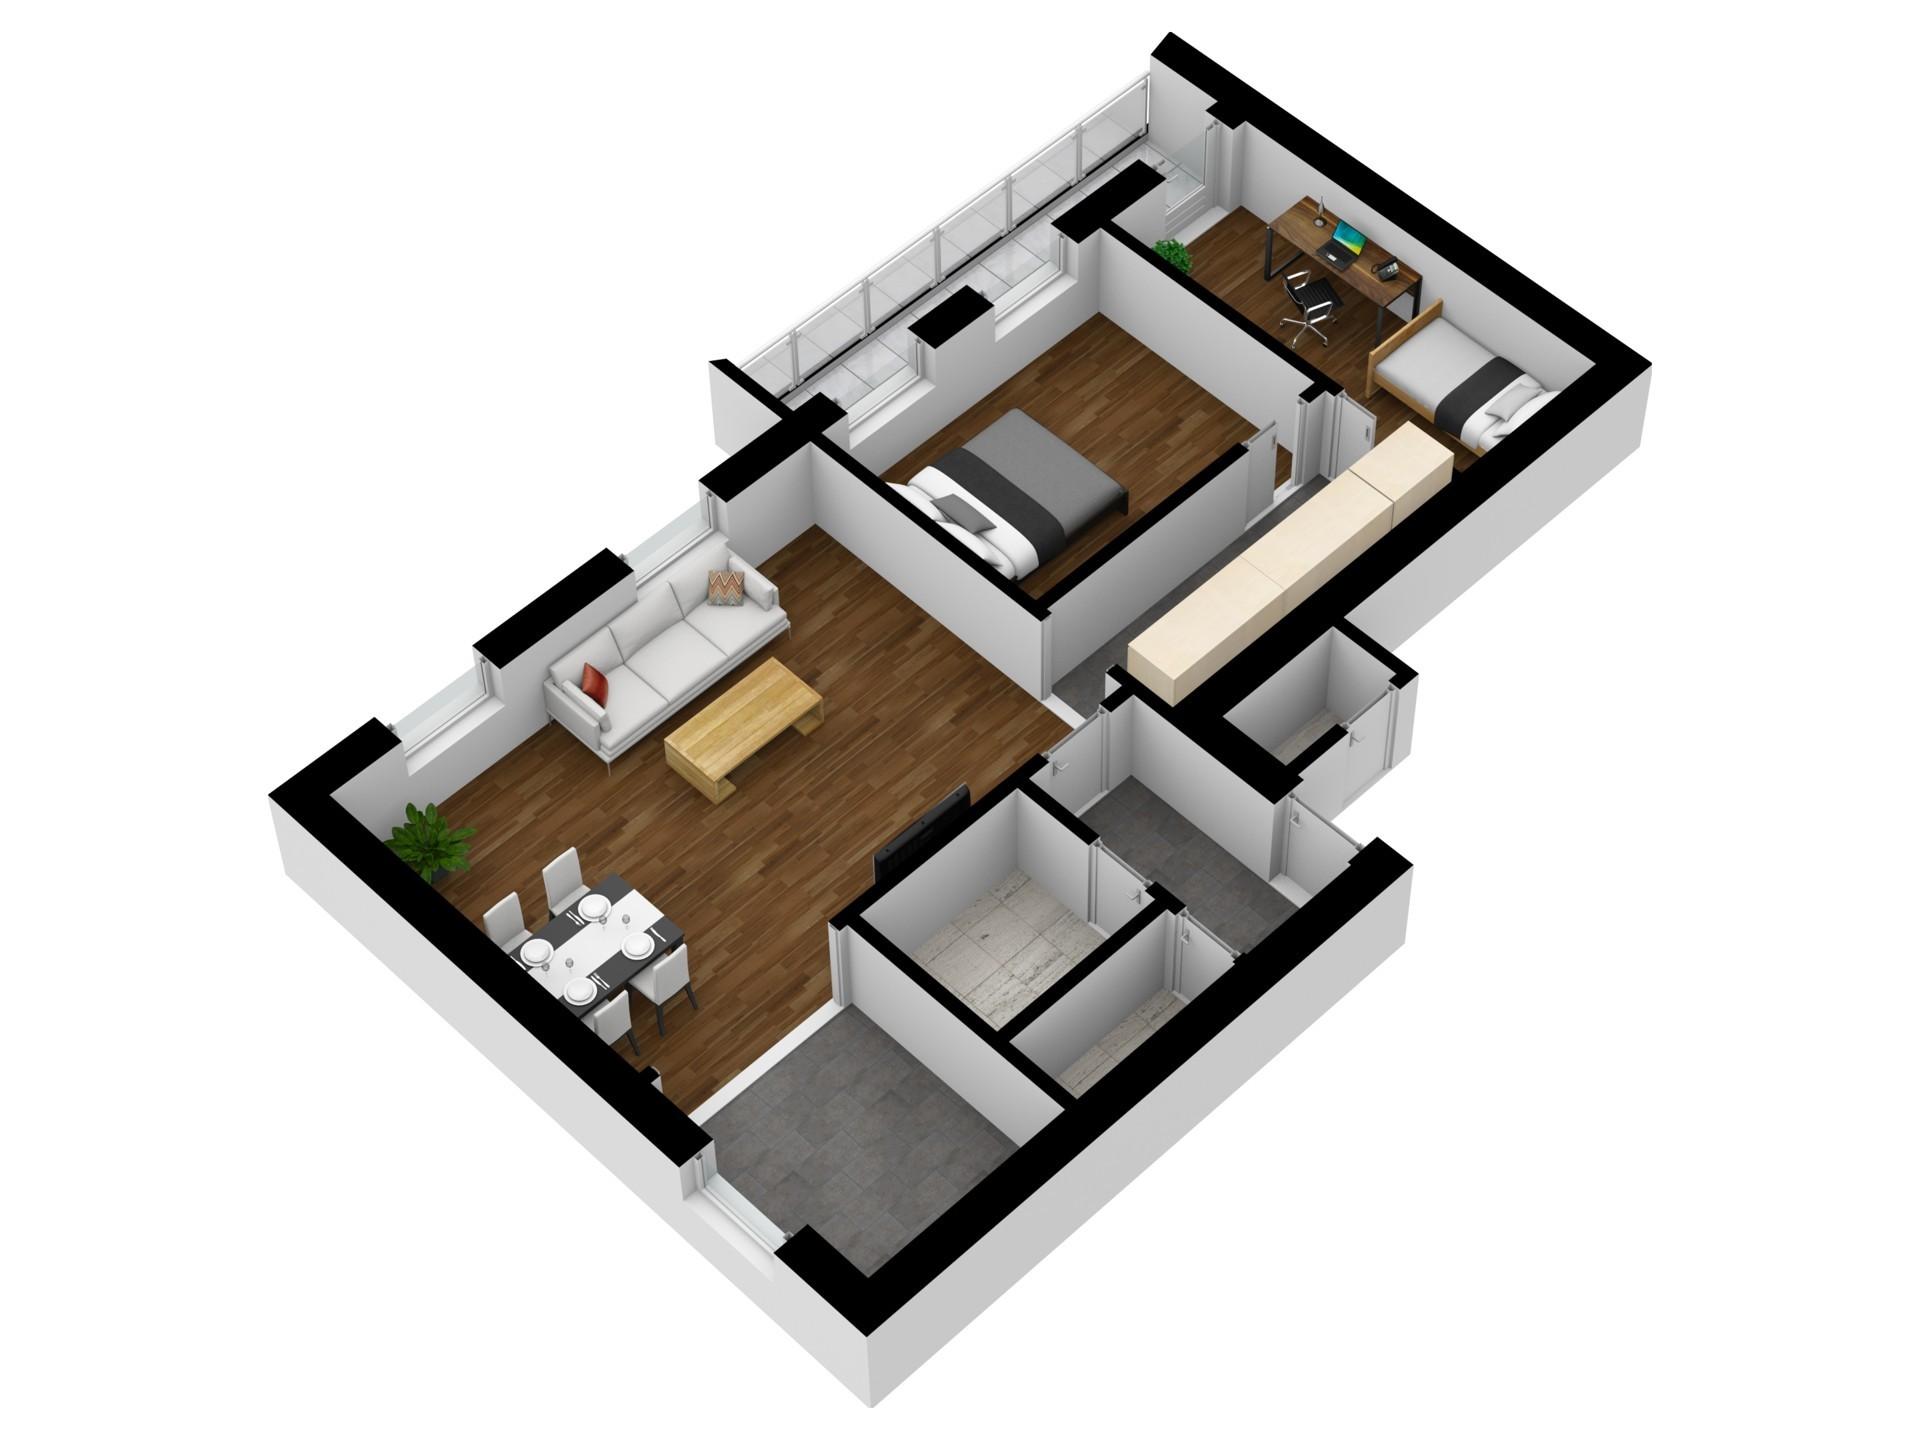 426_3dIsoSW-floor_1